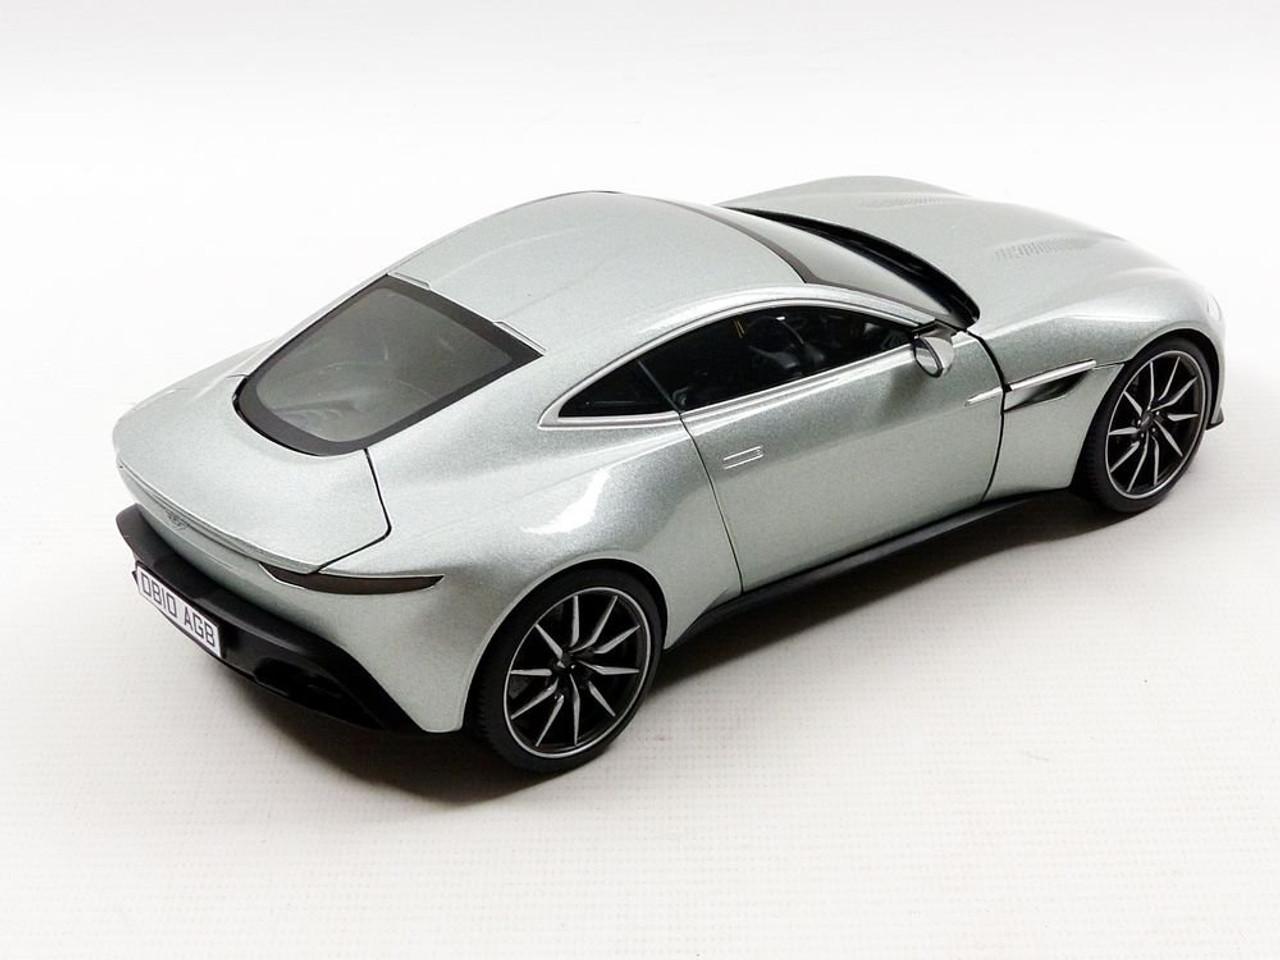 Hot Wheels James Bond 007 Spectre Aston Martin Db10 Car On